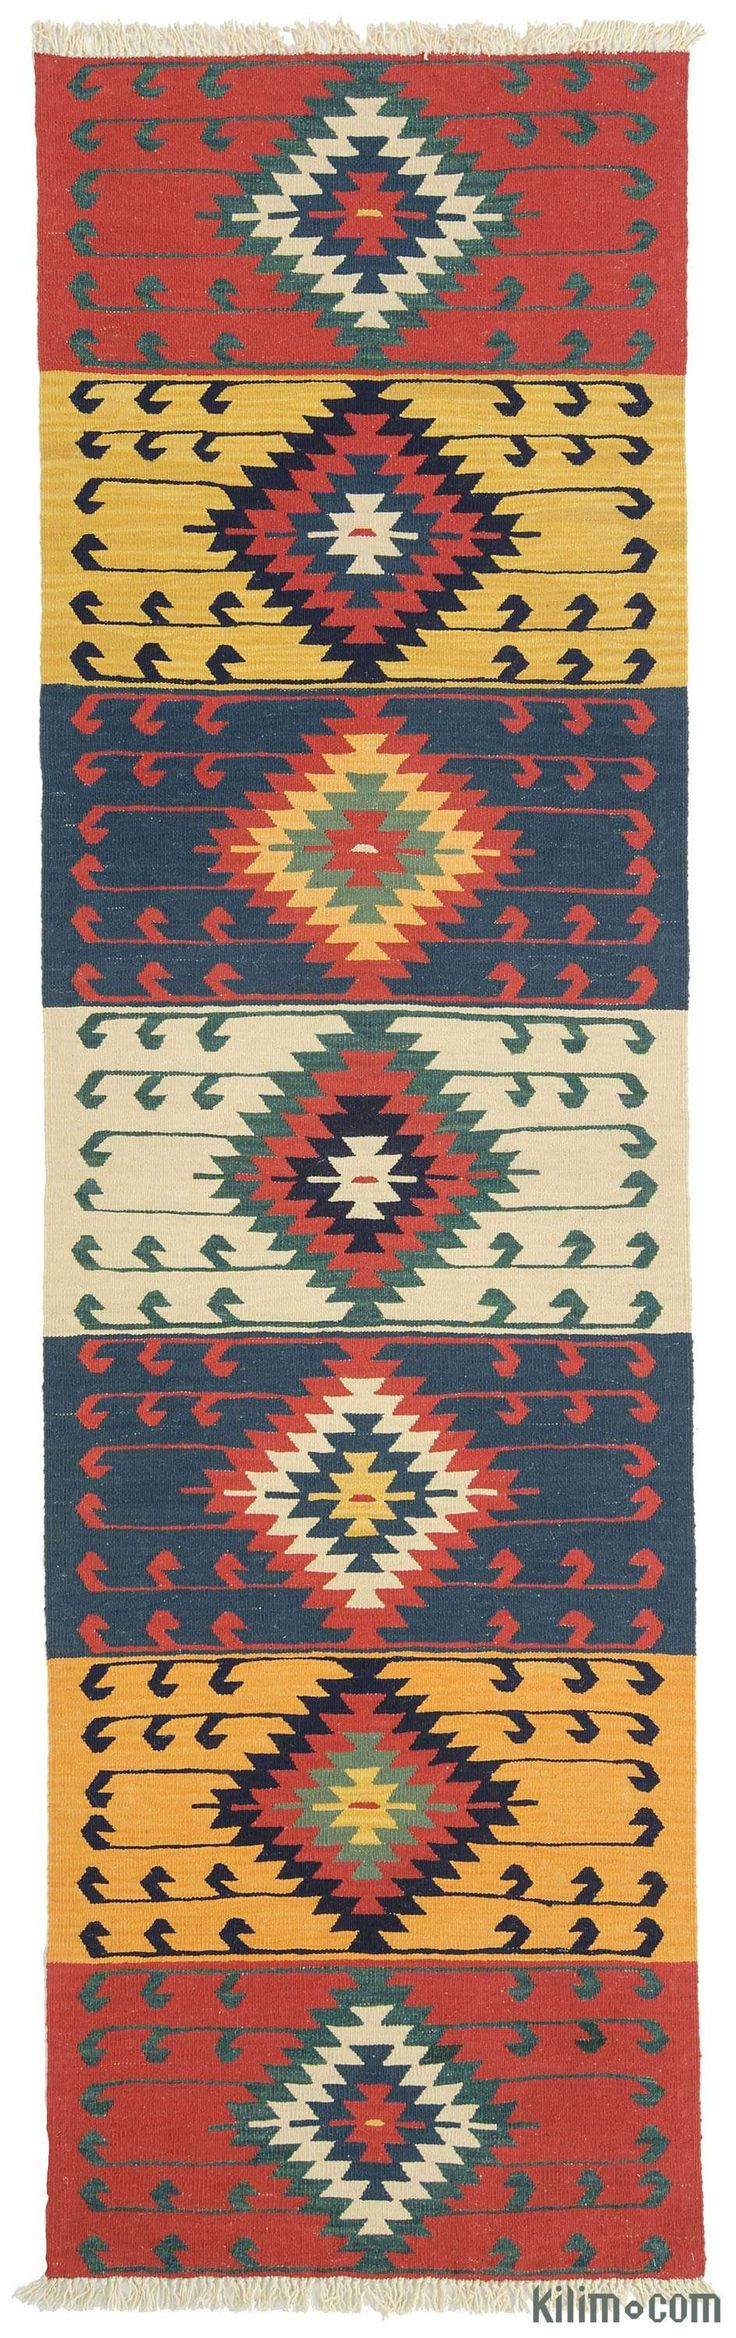 K0010796 New Turkish Kilim Runner Rug | Kilim Rugs, Overdyed Vintage Rugs, Hand-made Turkish Rugs, Patchwork Carpets by Kilim.com